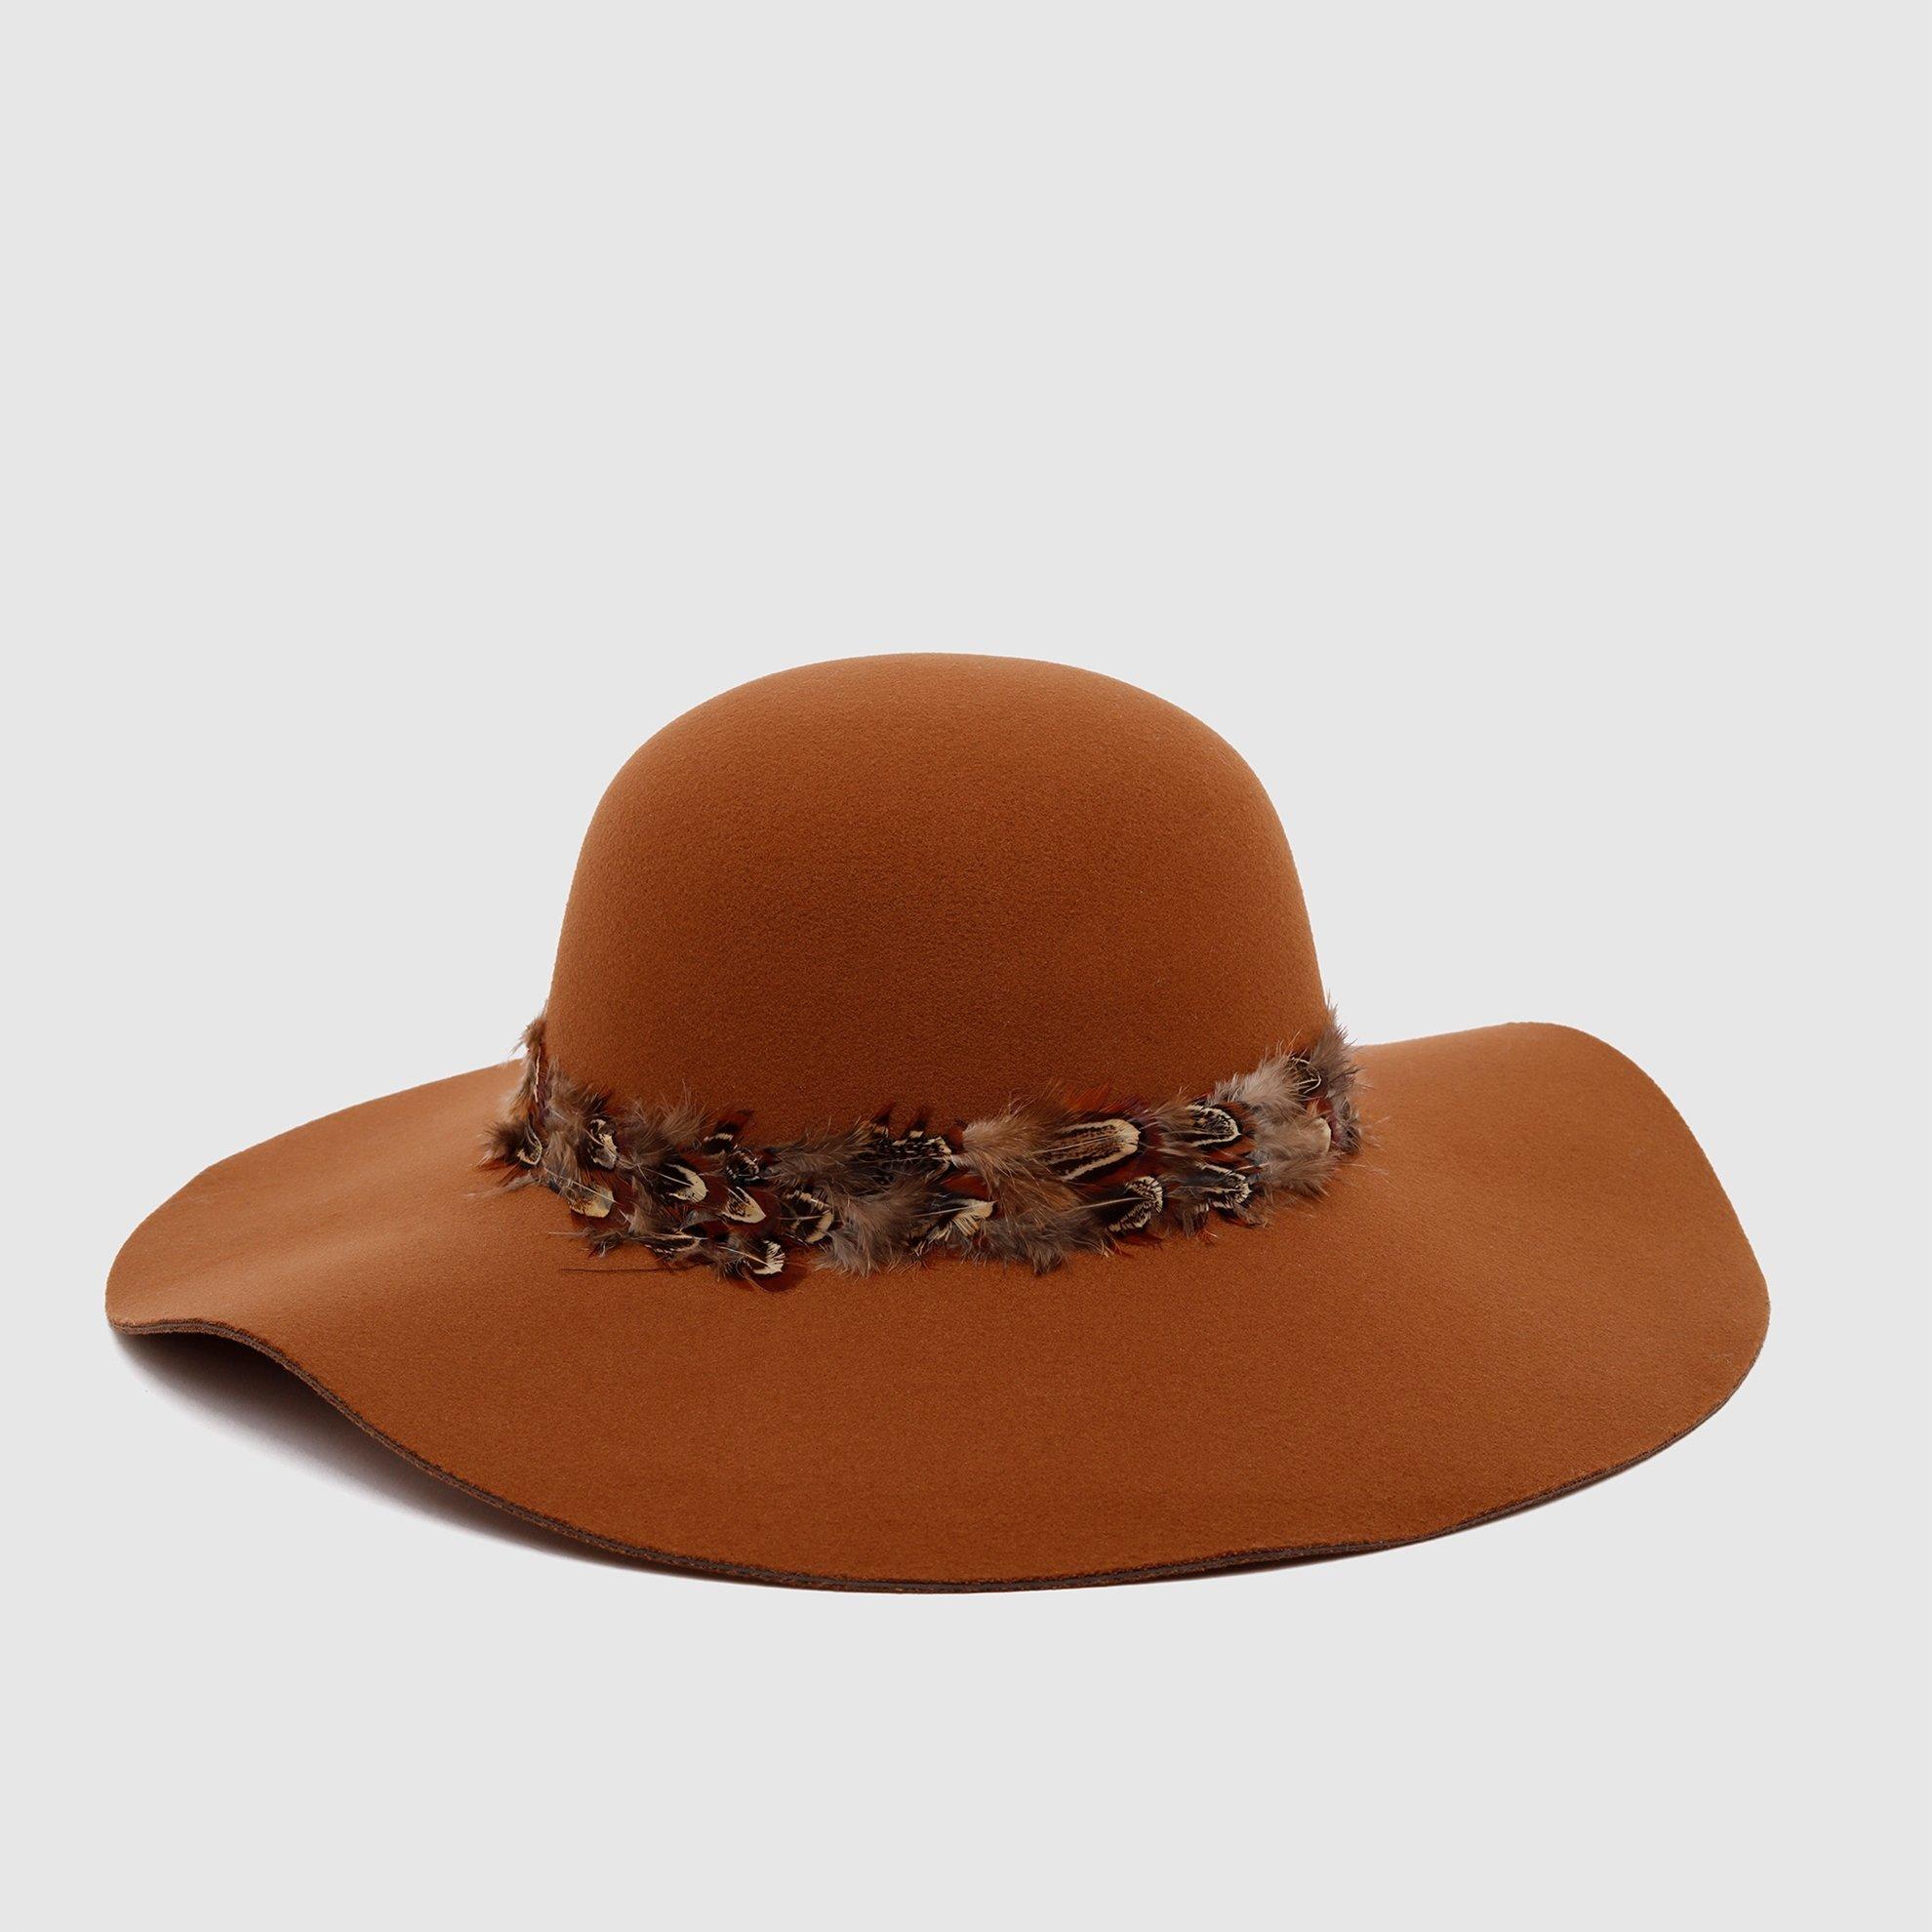 resm Tüy Detaylı Şapka